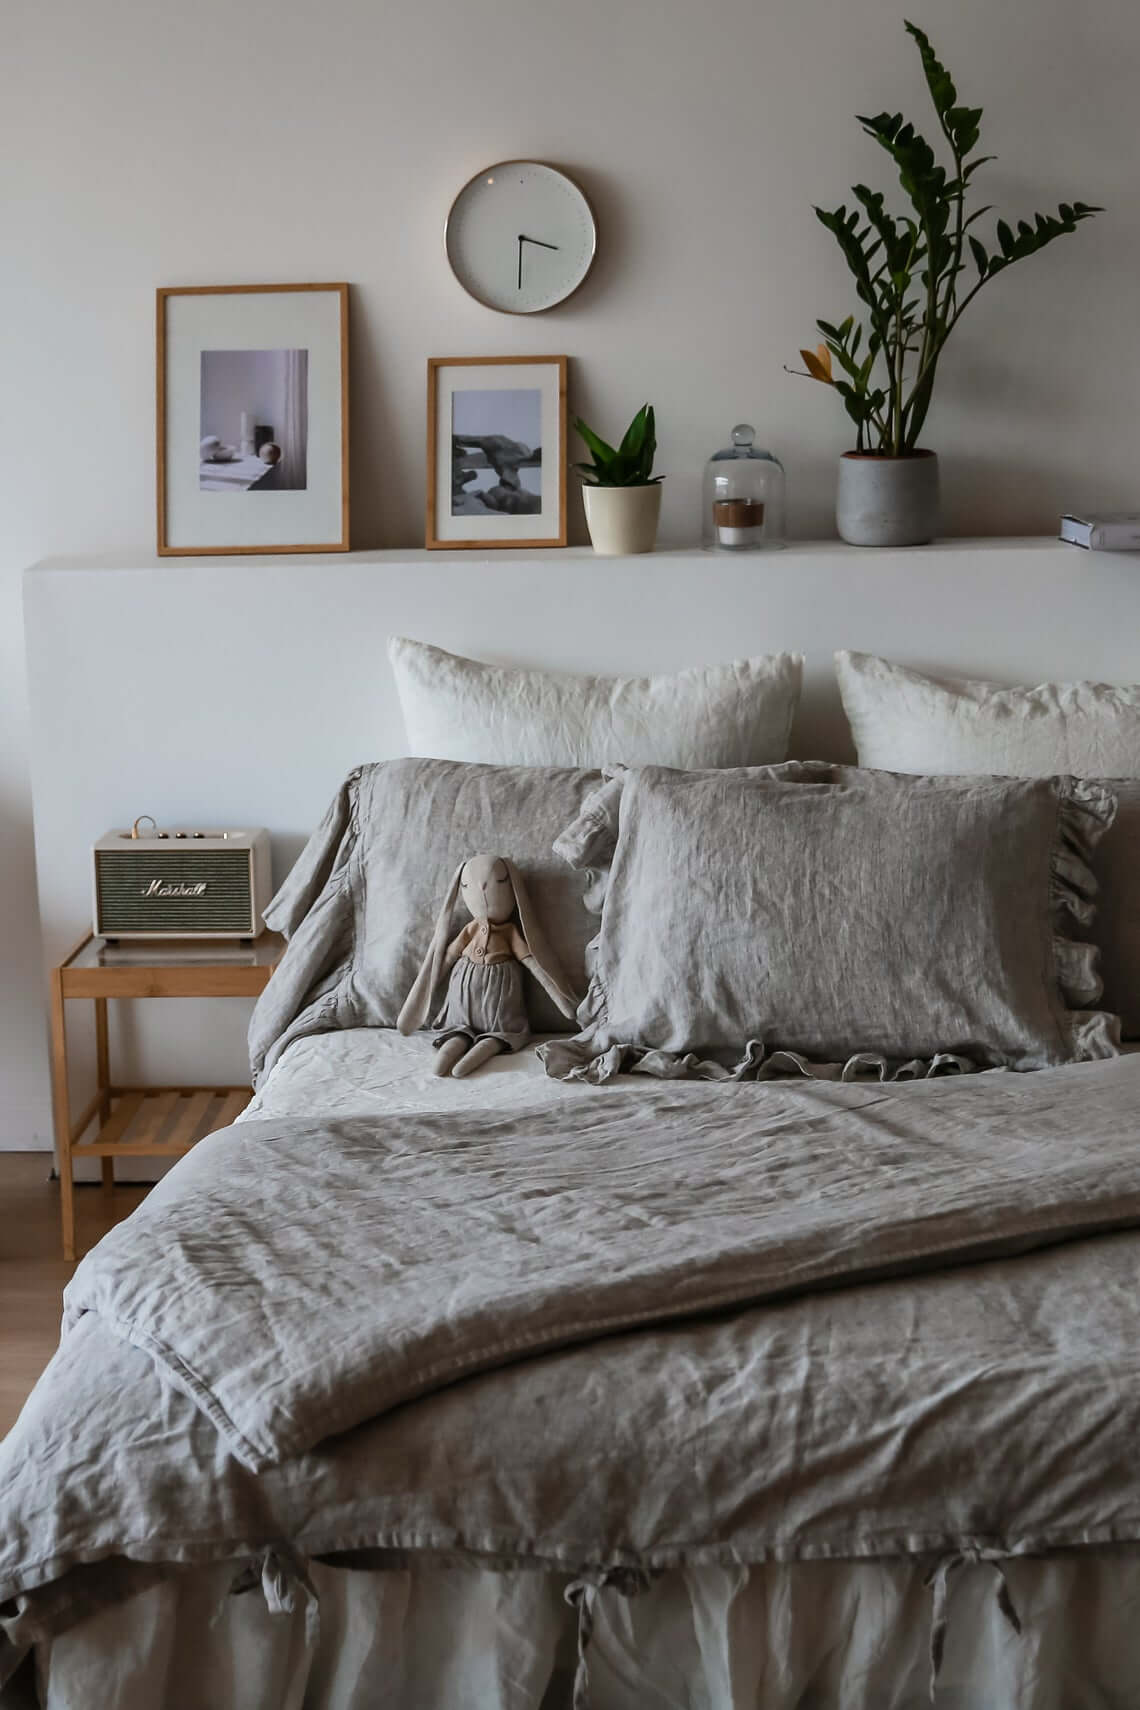 Clean, Crisp, and White Bedroom Design